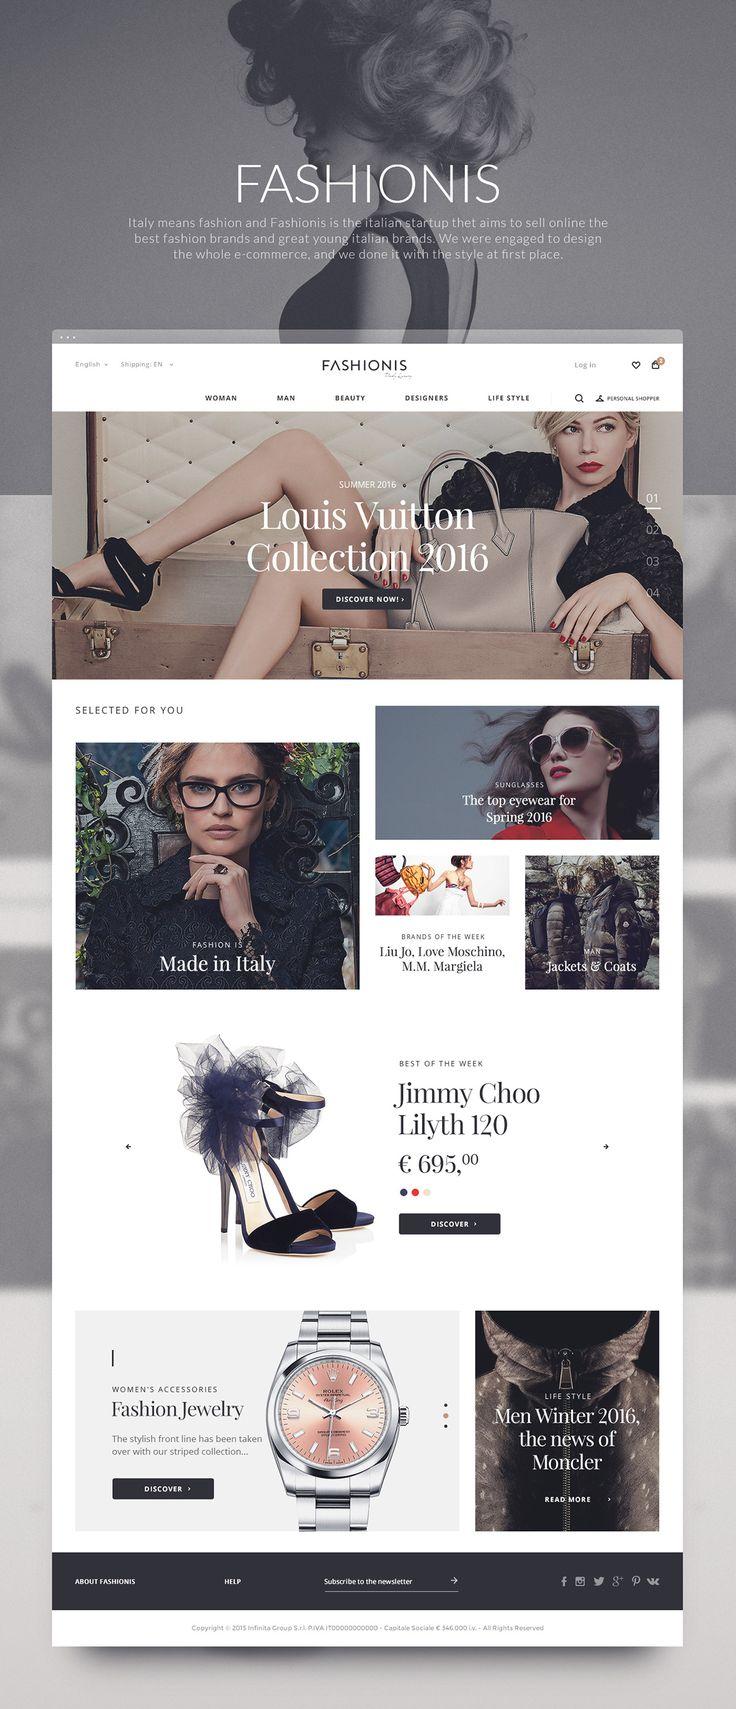 Fashionis on Web Design Served